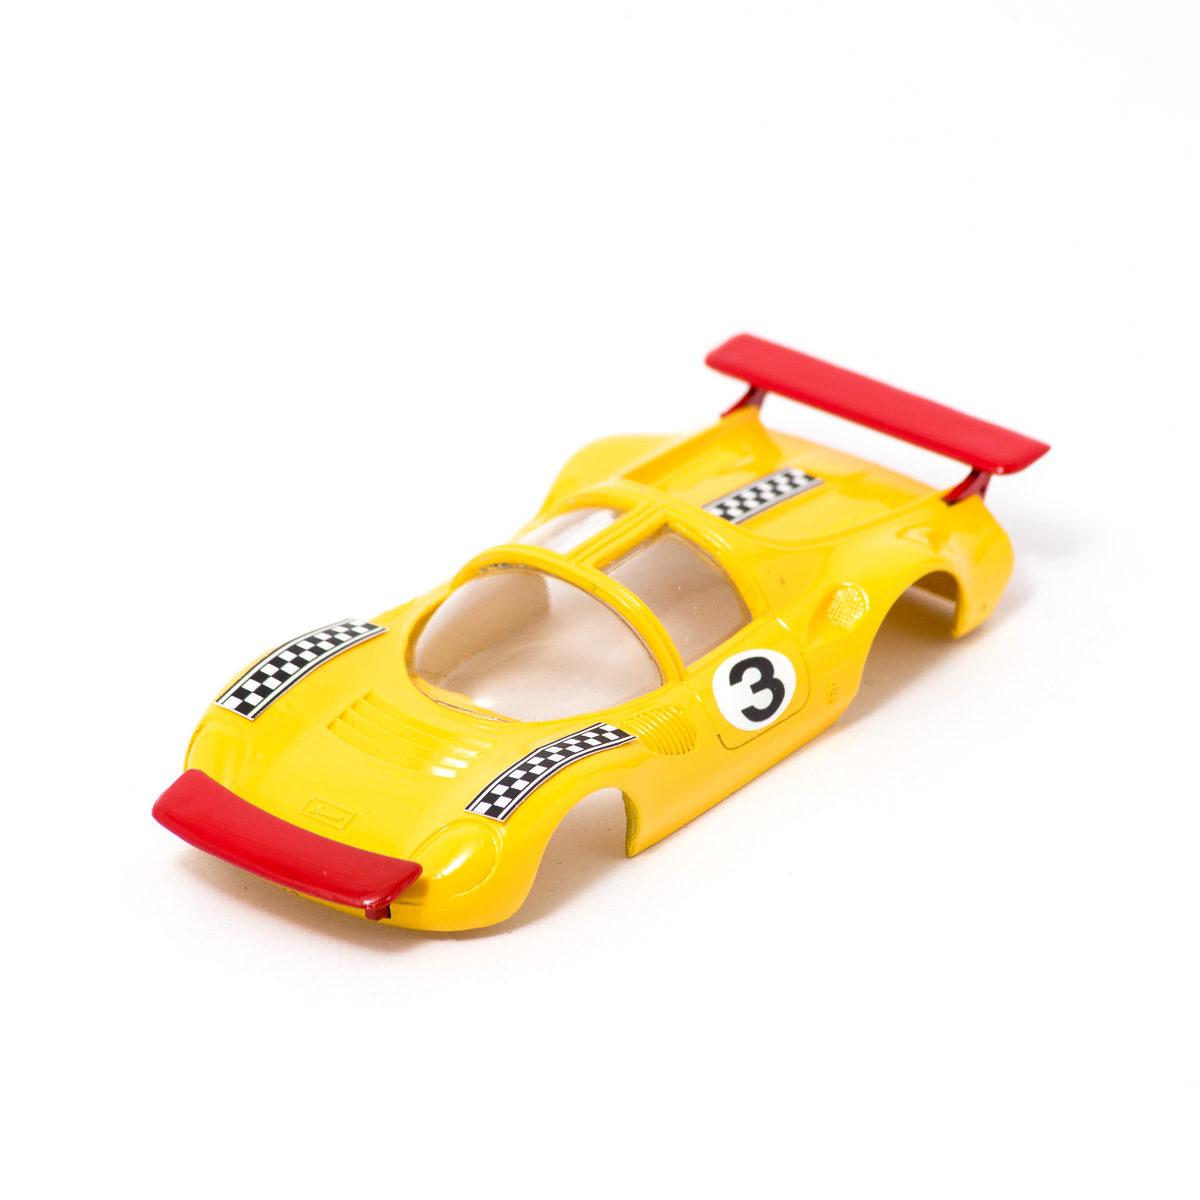 Carrozzeria Slot Car 206 Dino Pininfarina 1/32 Policar